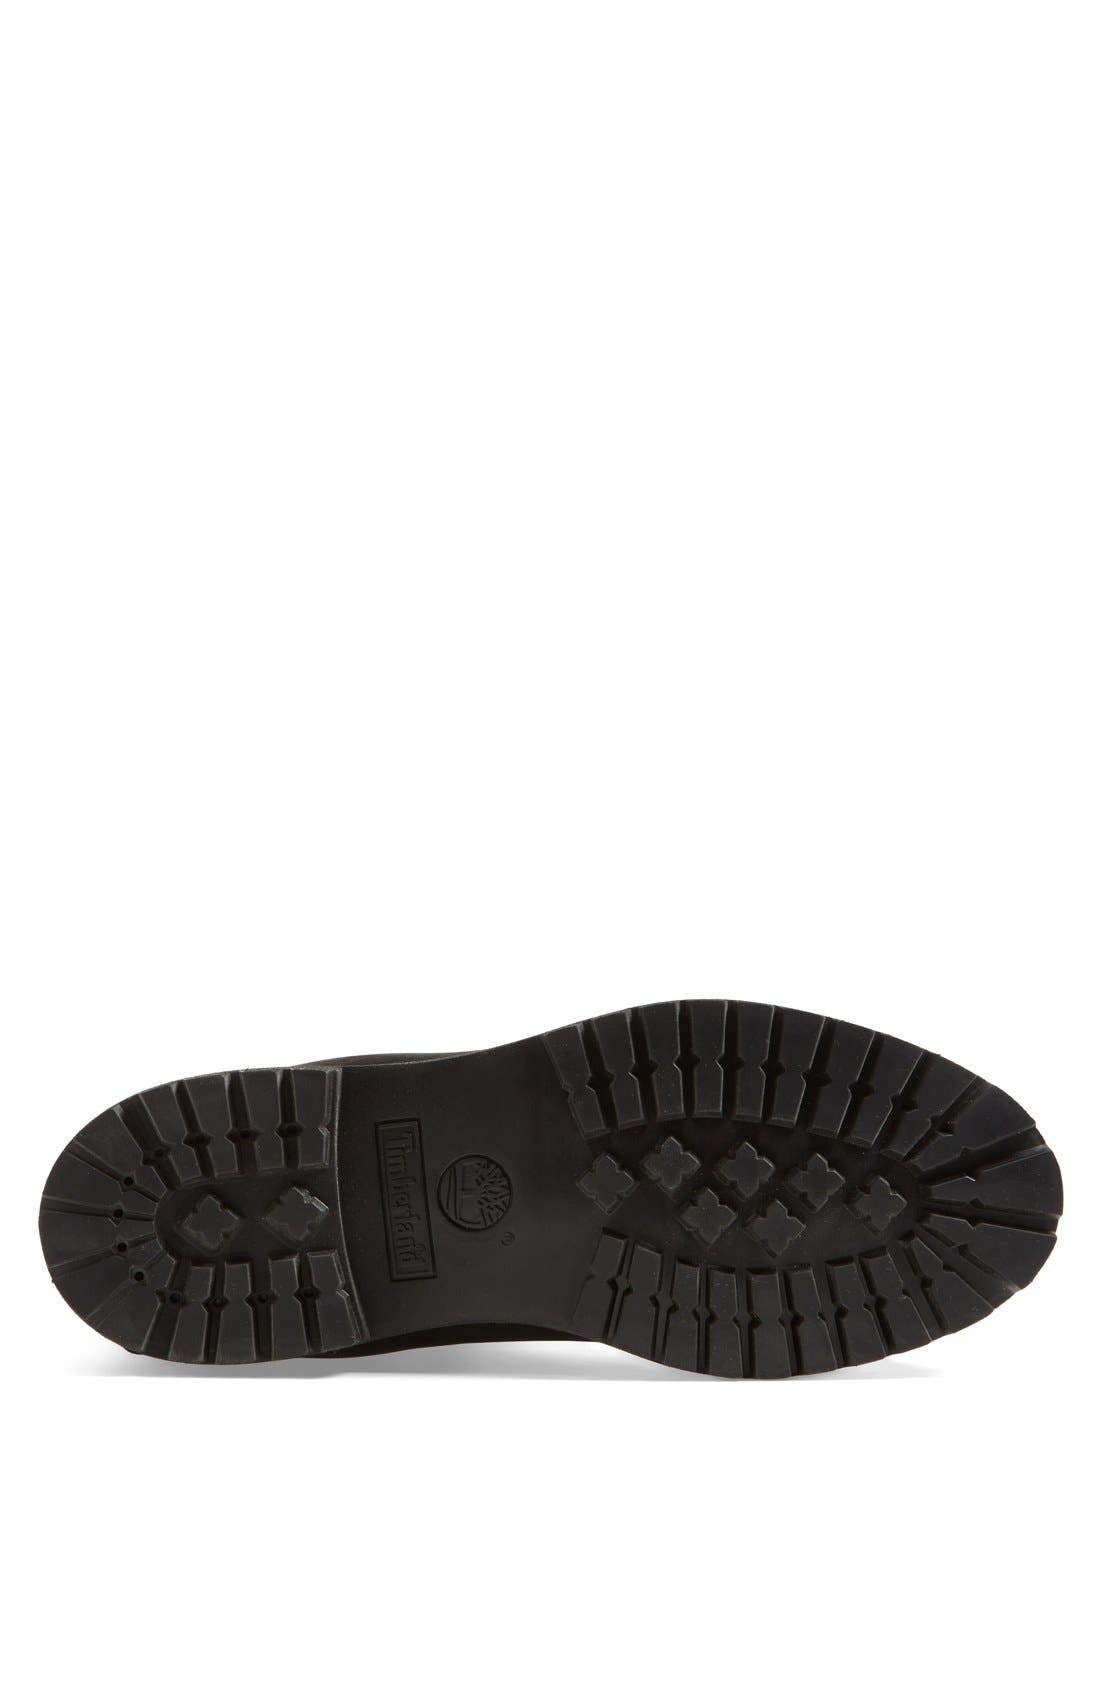 TIMBERLAND, Six Inch Classic Waterproof Boots - Premium Waterproof Boot, Alternate thumbnail 4, color, BLACK